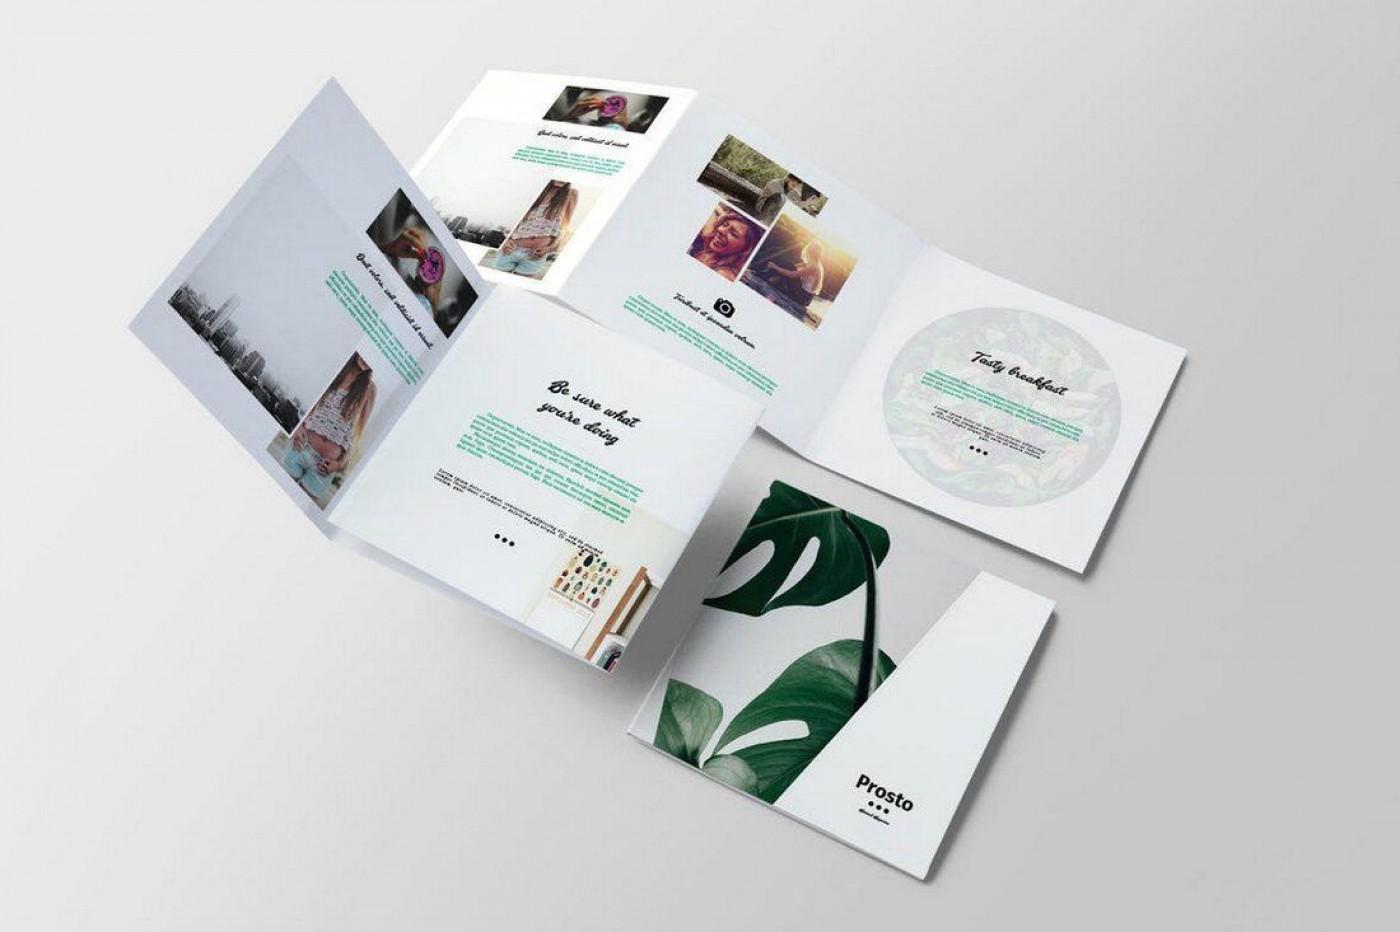 006 Beautiful Indesign Trifold Brochure Template Picture  Tri Fold A4 Bi Free Download1400